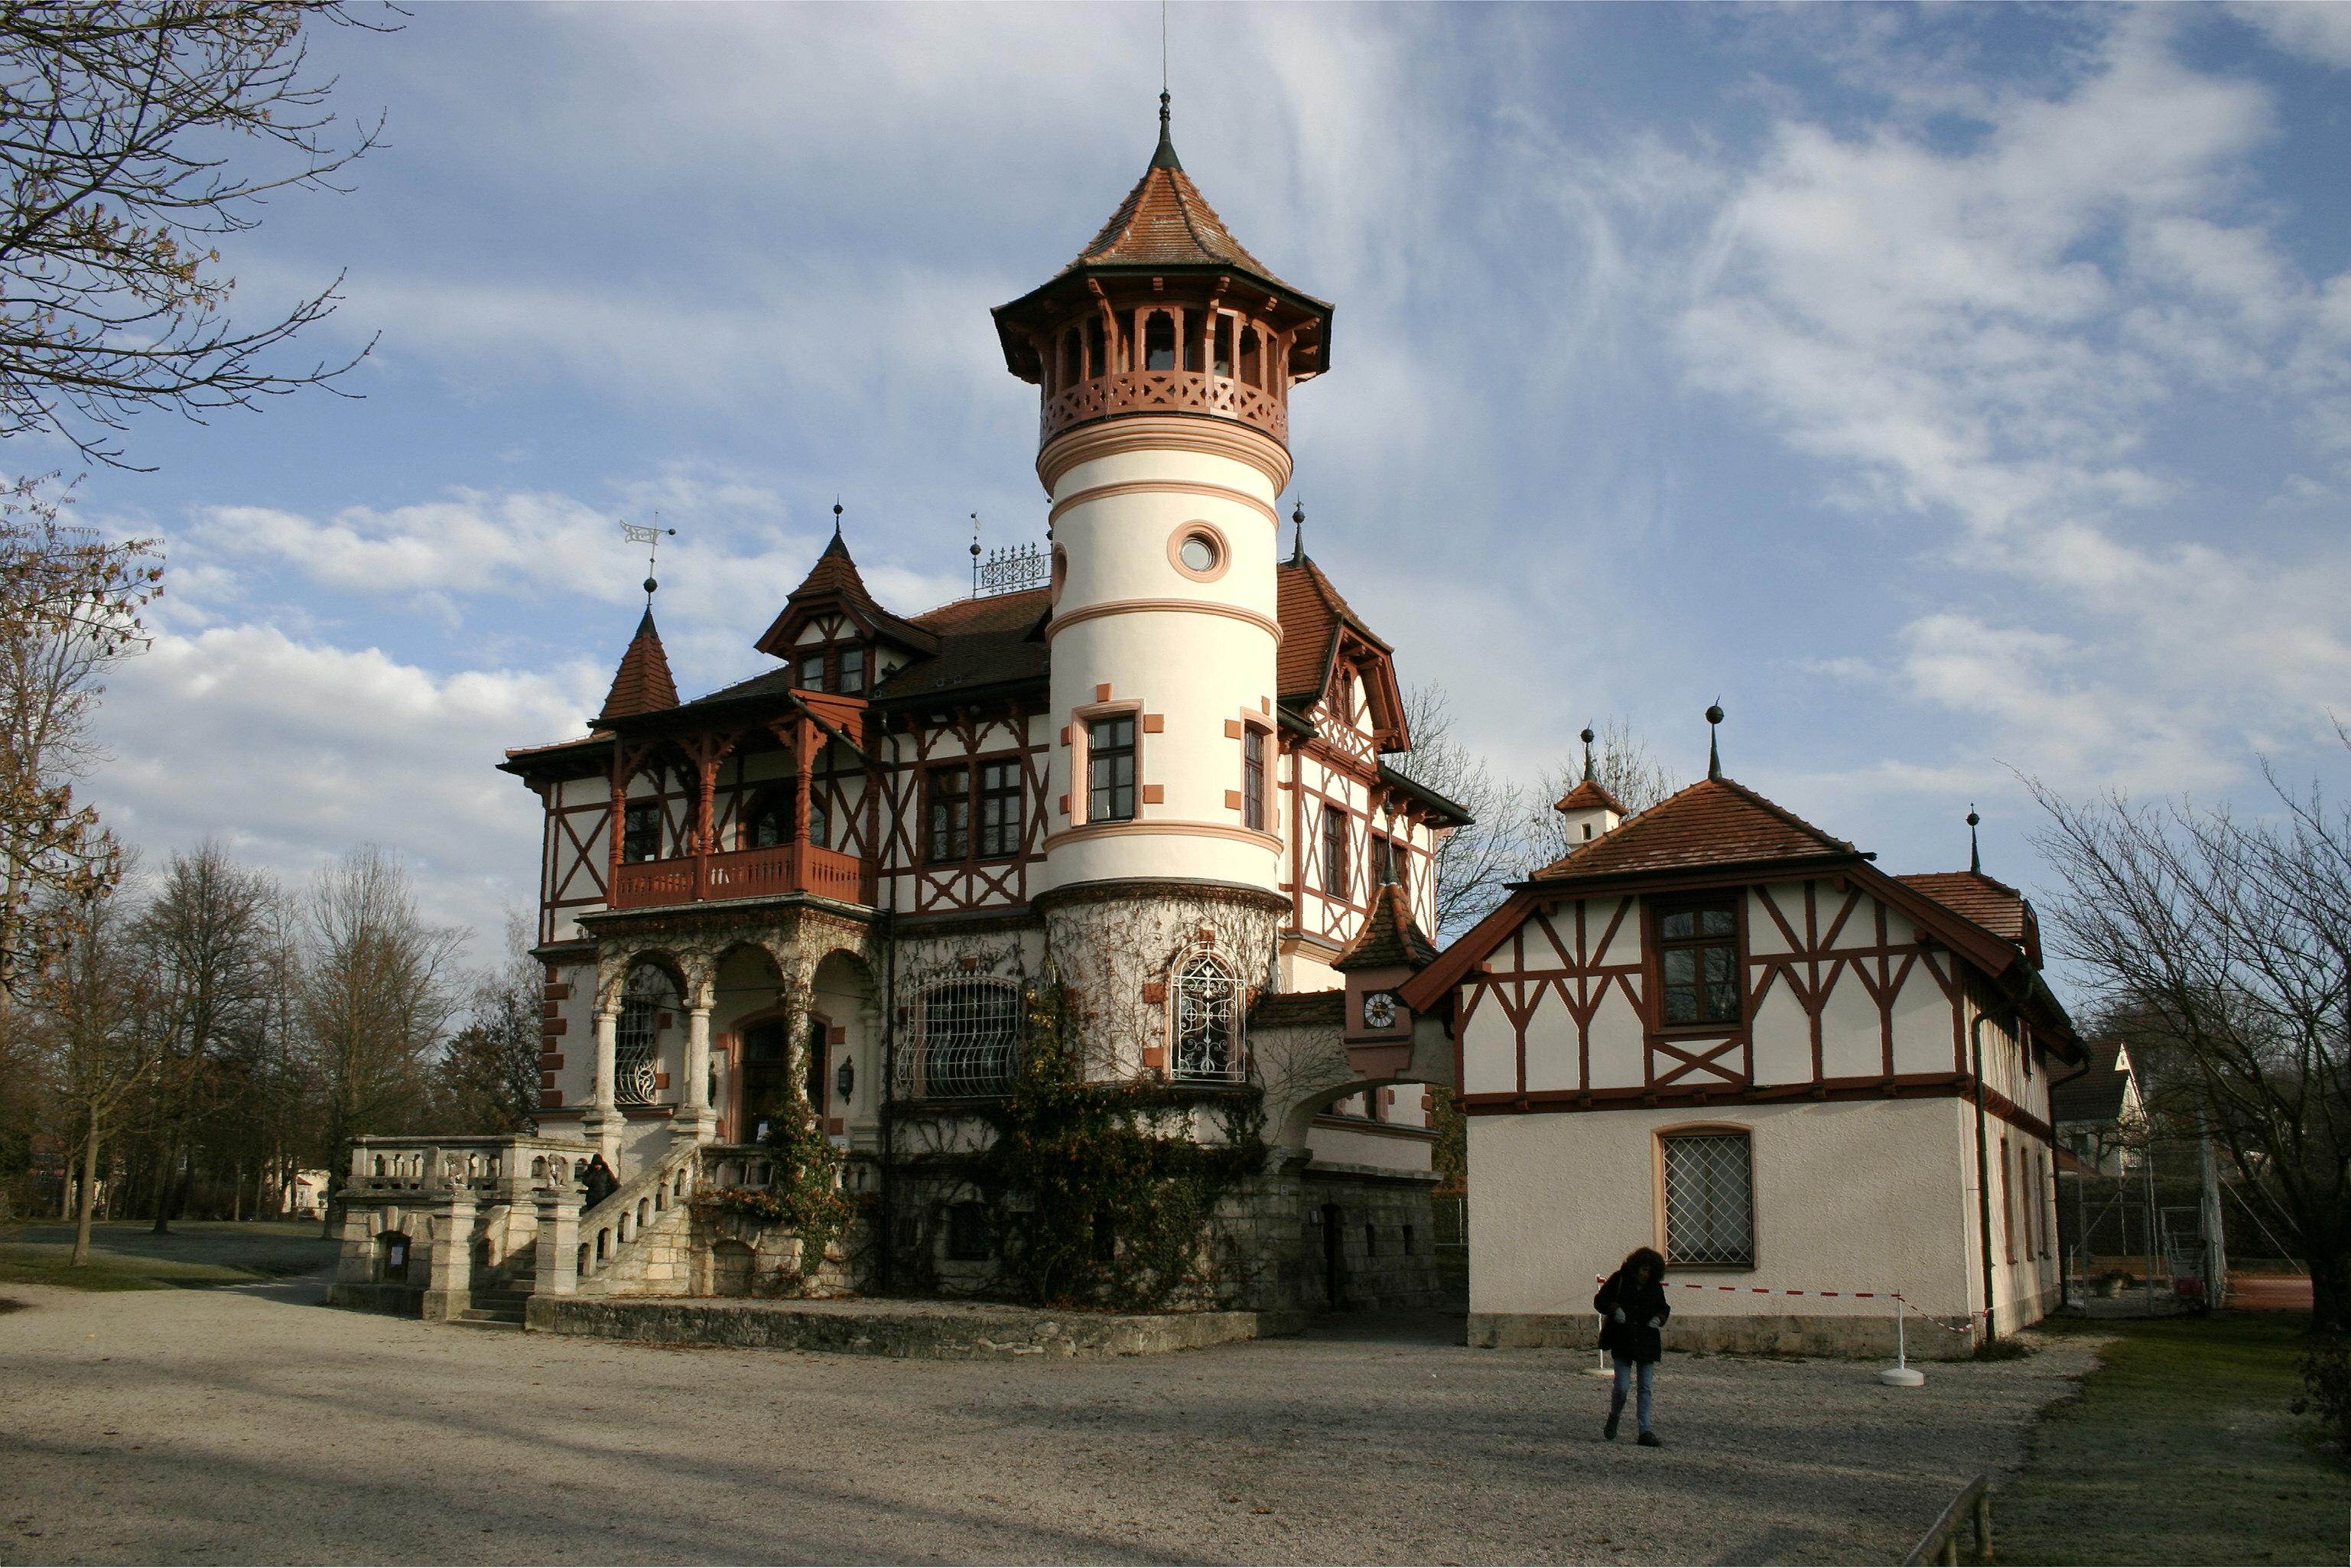 file herrsching little castle wikimedia commons